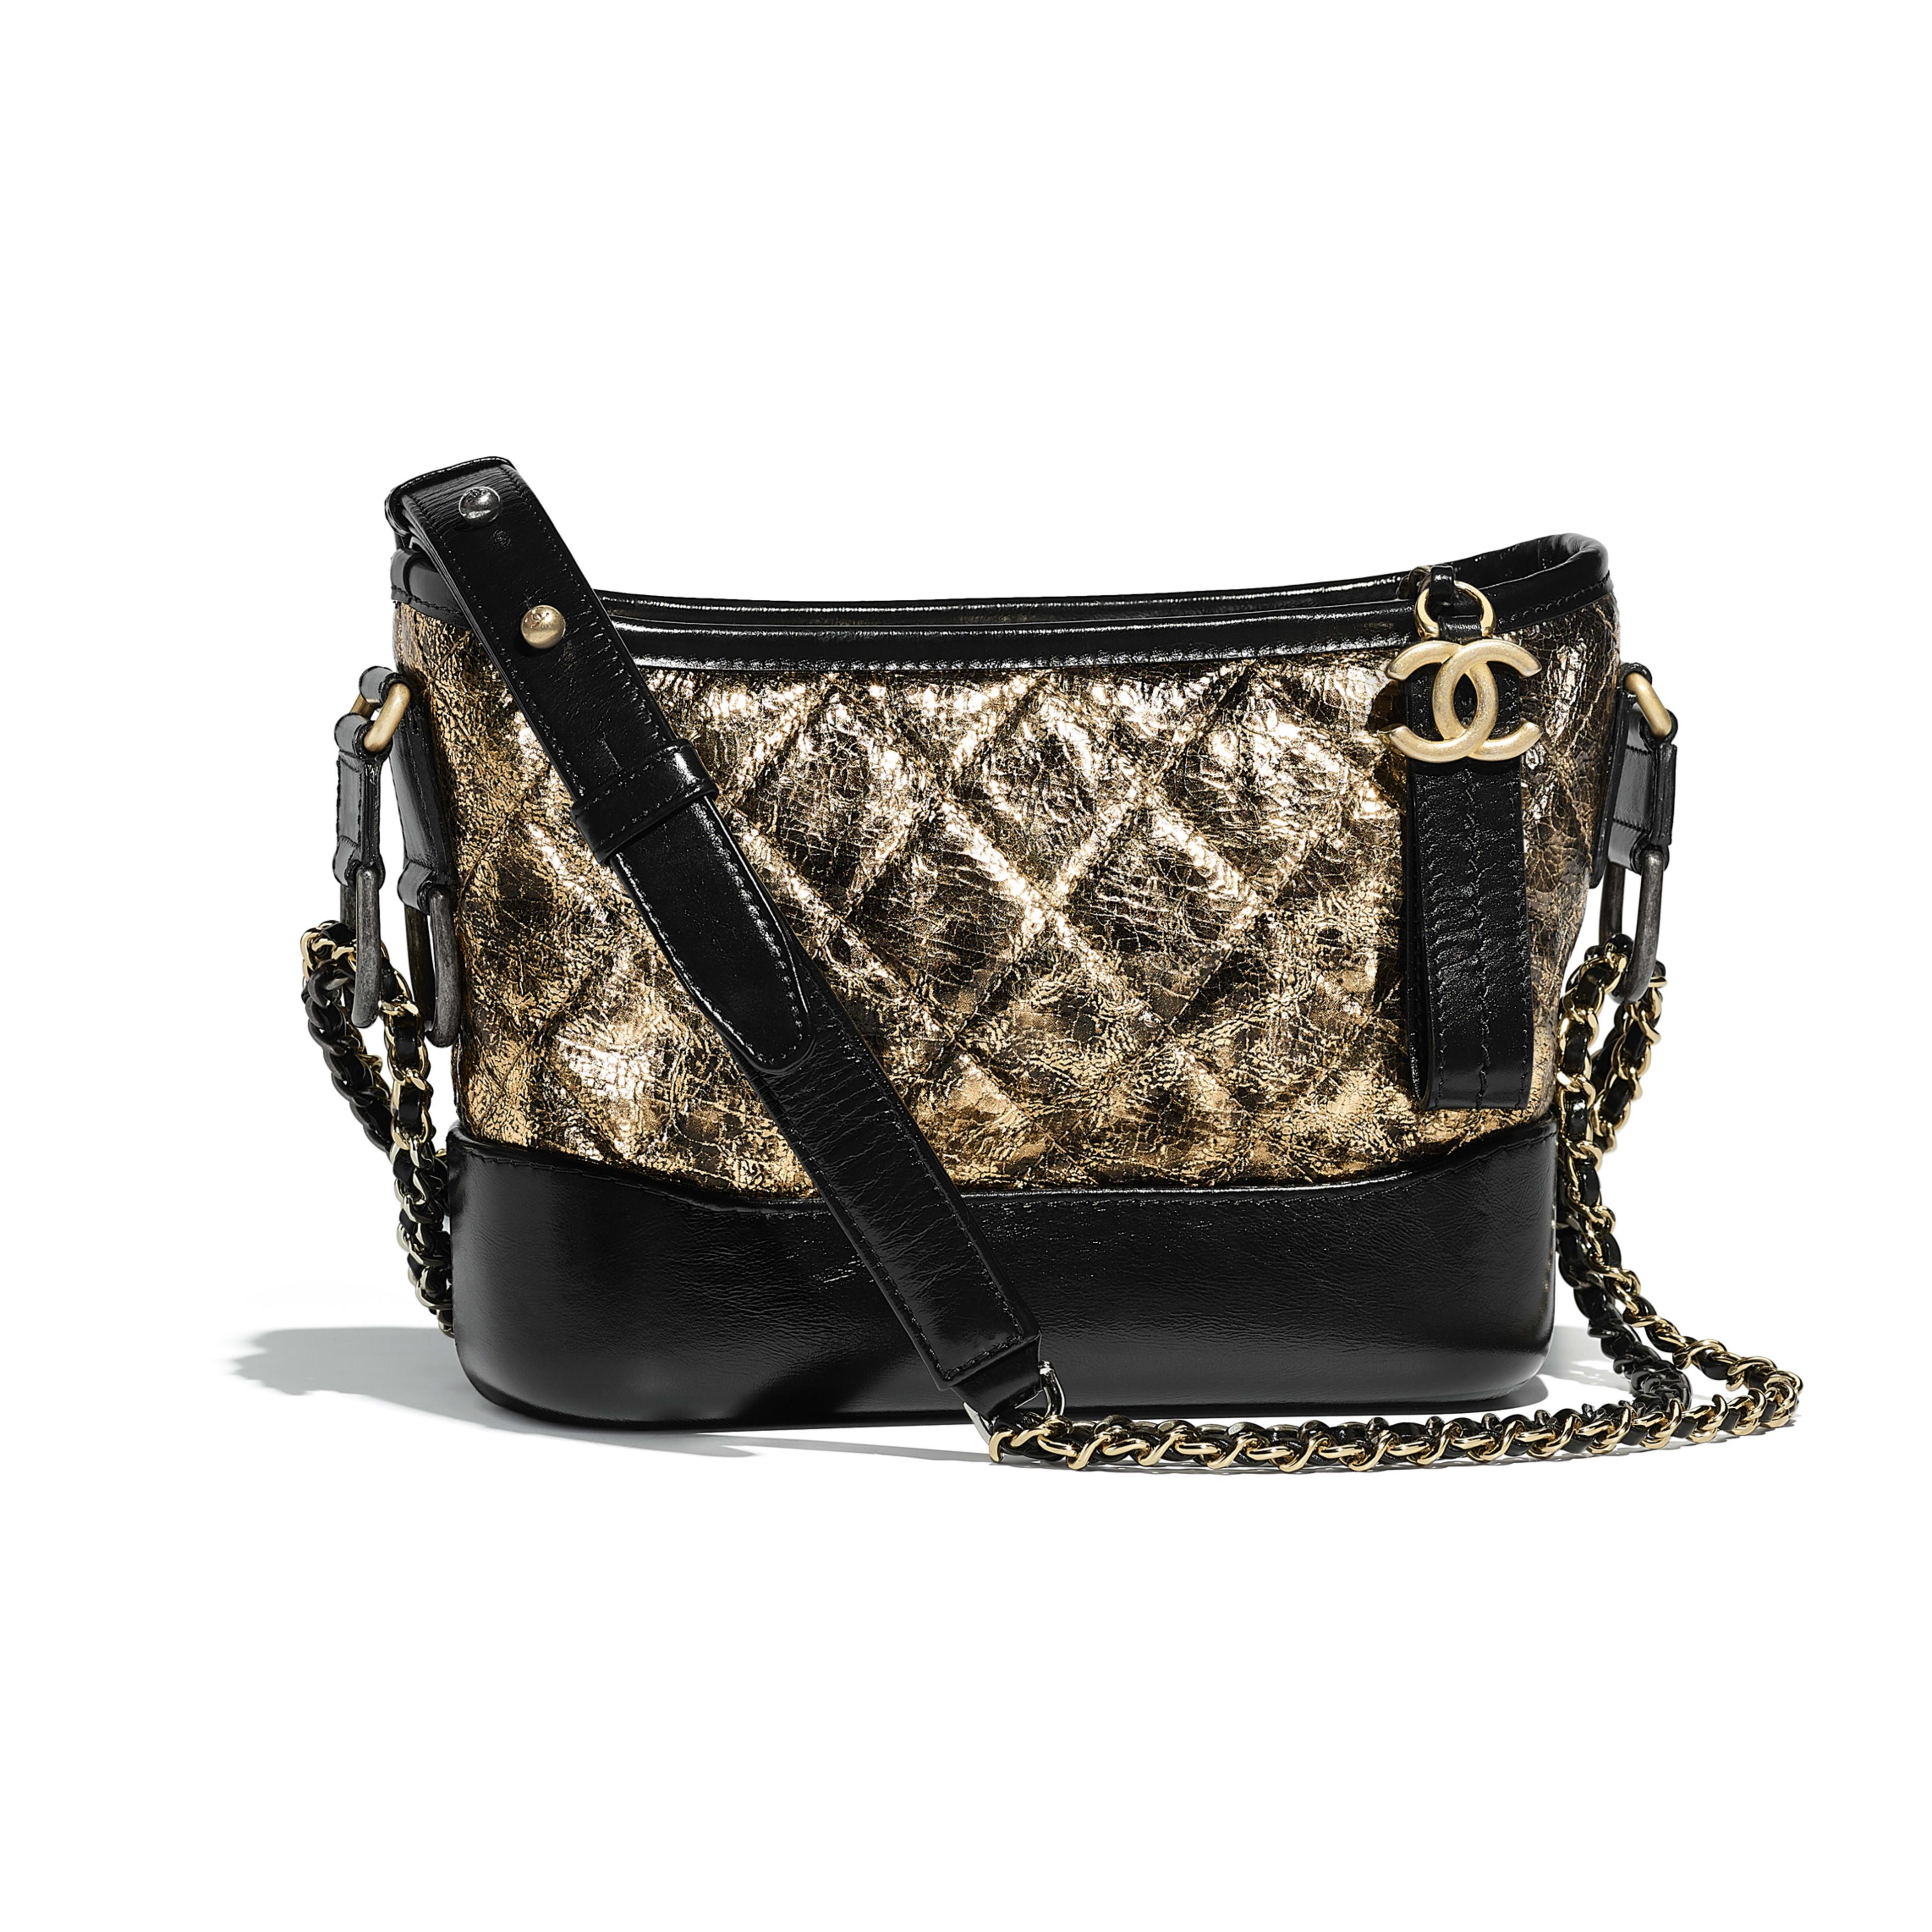 Chanel S Gabrielle Small Hobo Bag Black Gold Metallic Crumpled Goatskin Calfskin